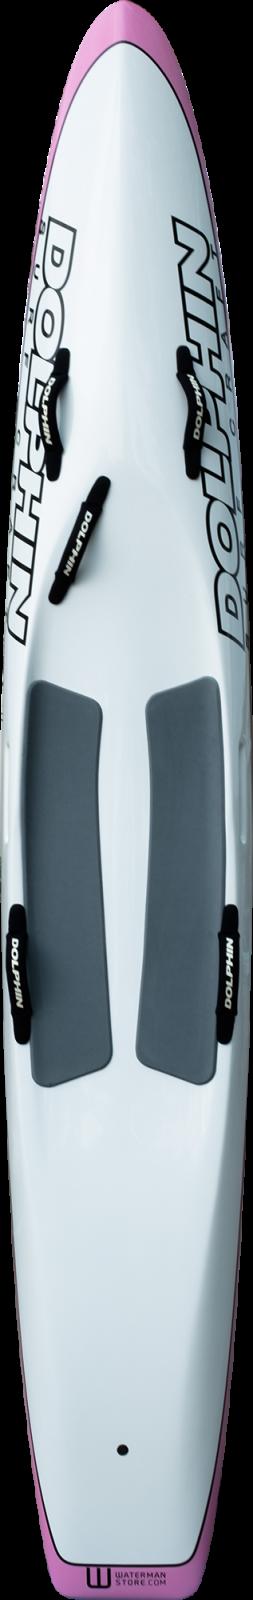 Dolphin 10'6 L - 485